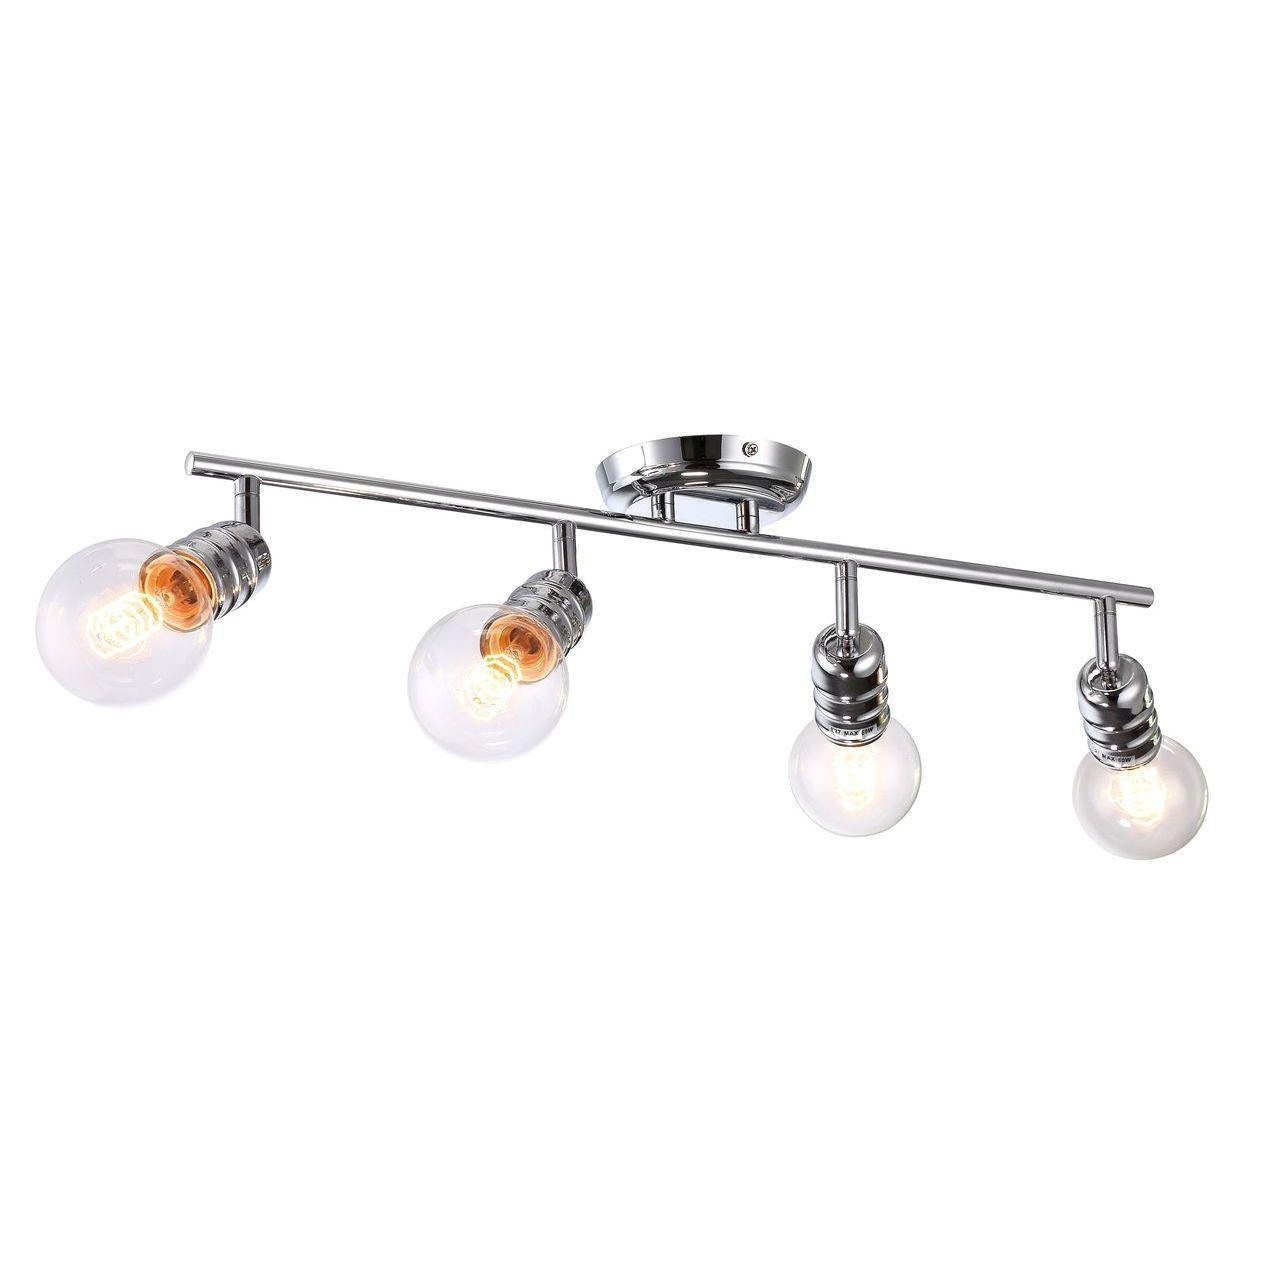 Спот Arte Lamp Fuoco A9265PL-4CC